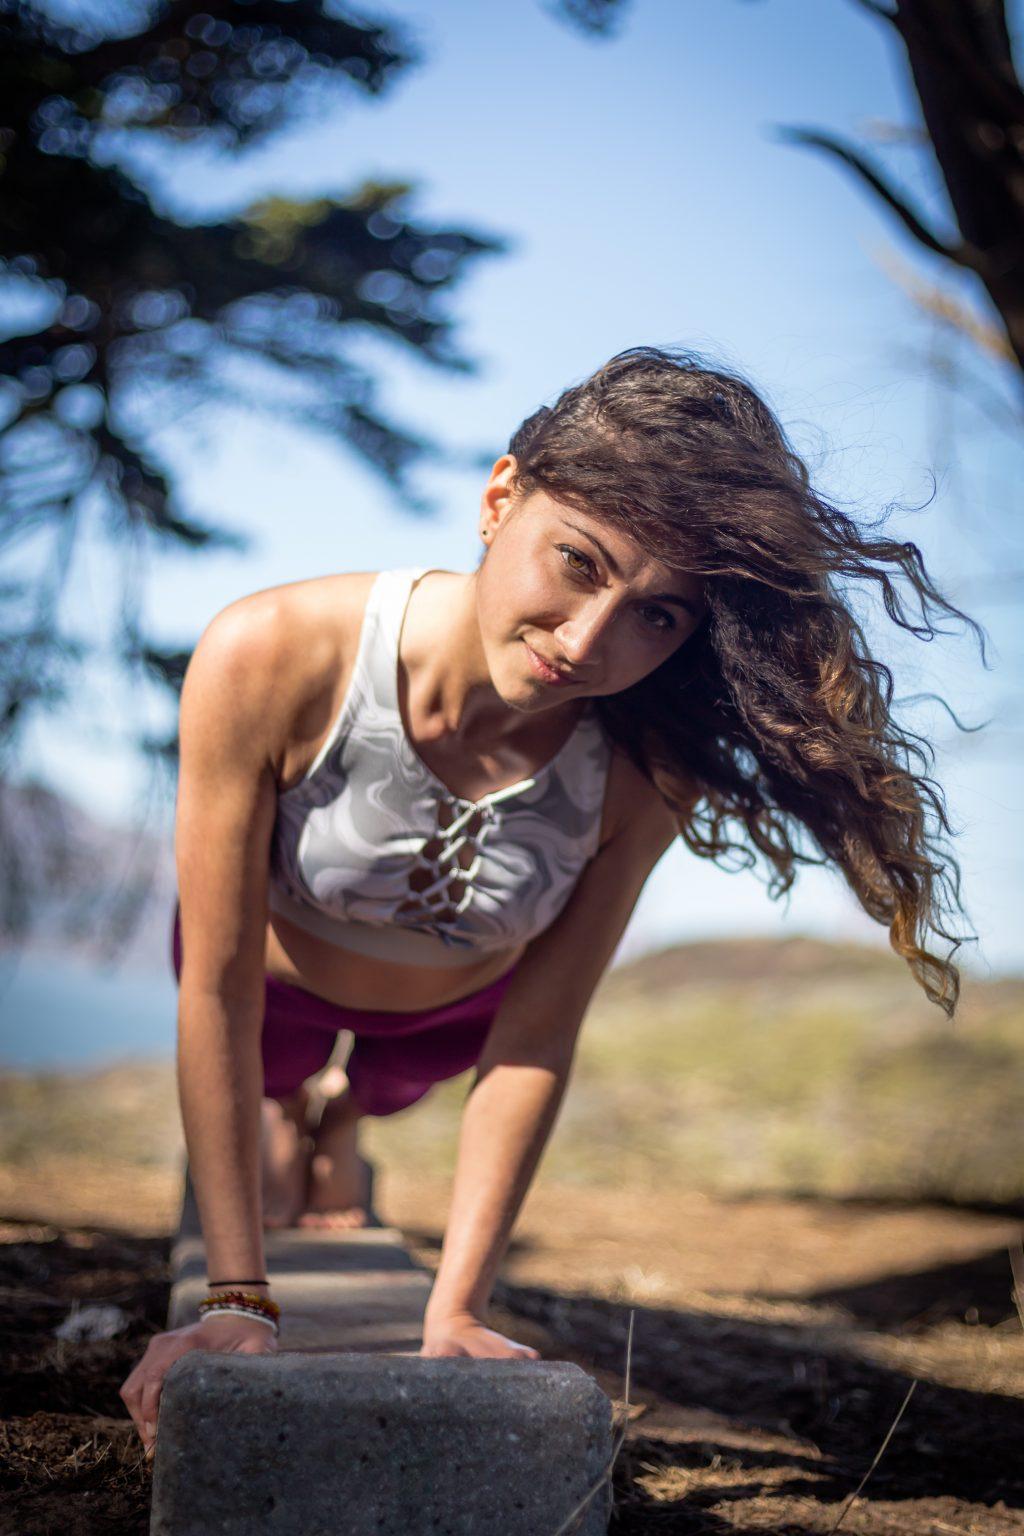 Personal Trainer Denver, Colorado - Kremi Arabadjieva